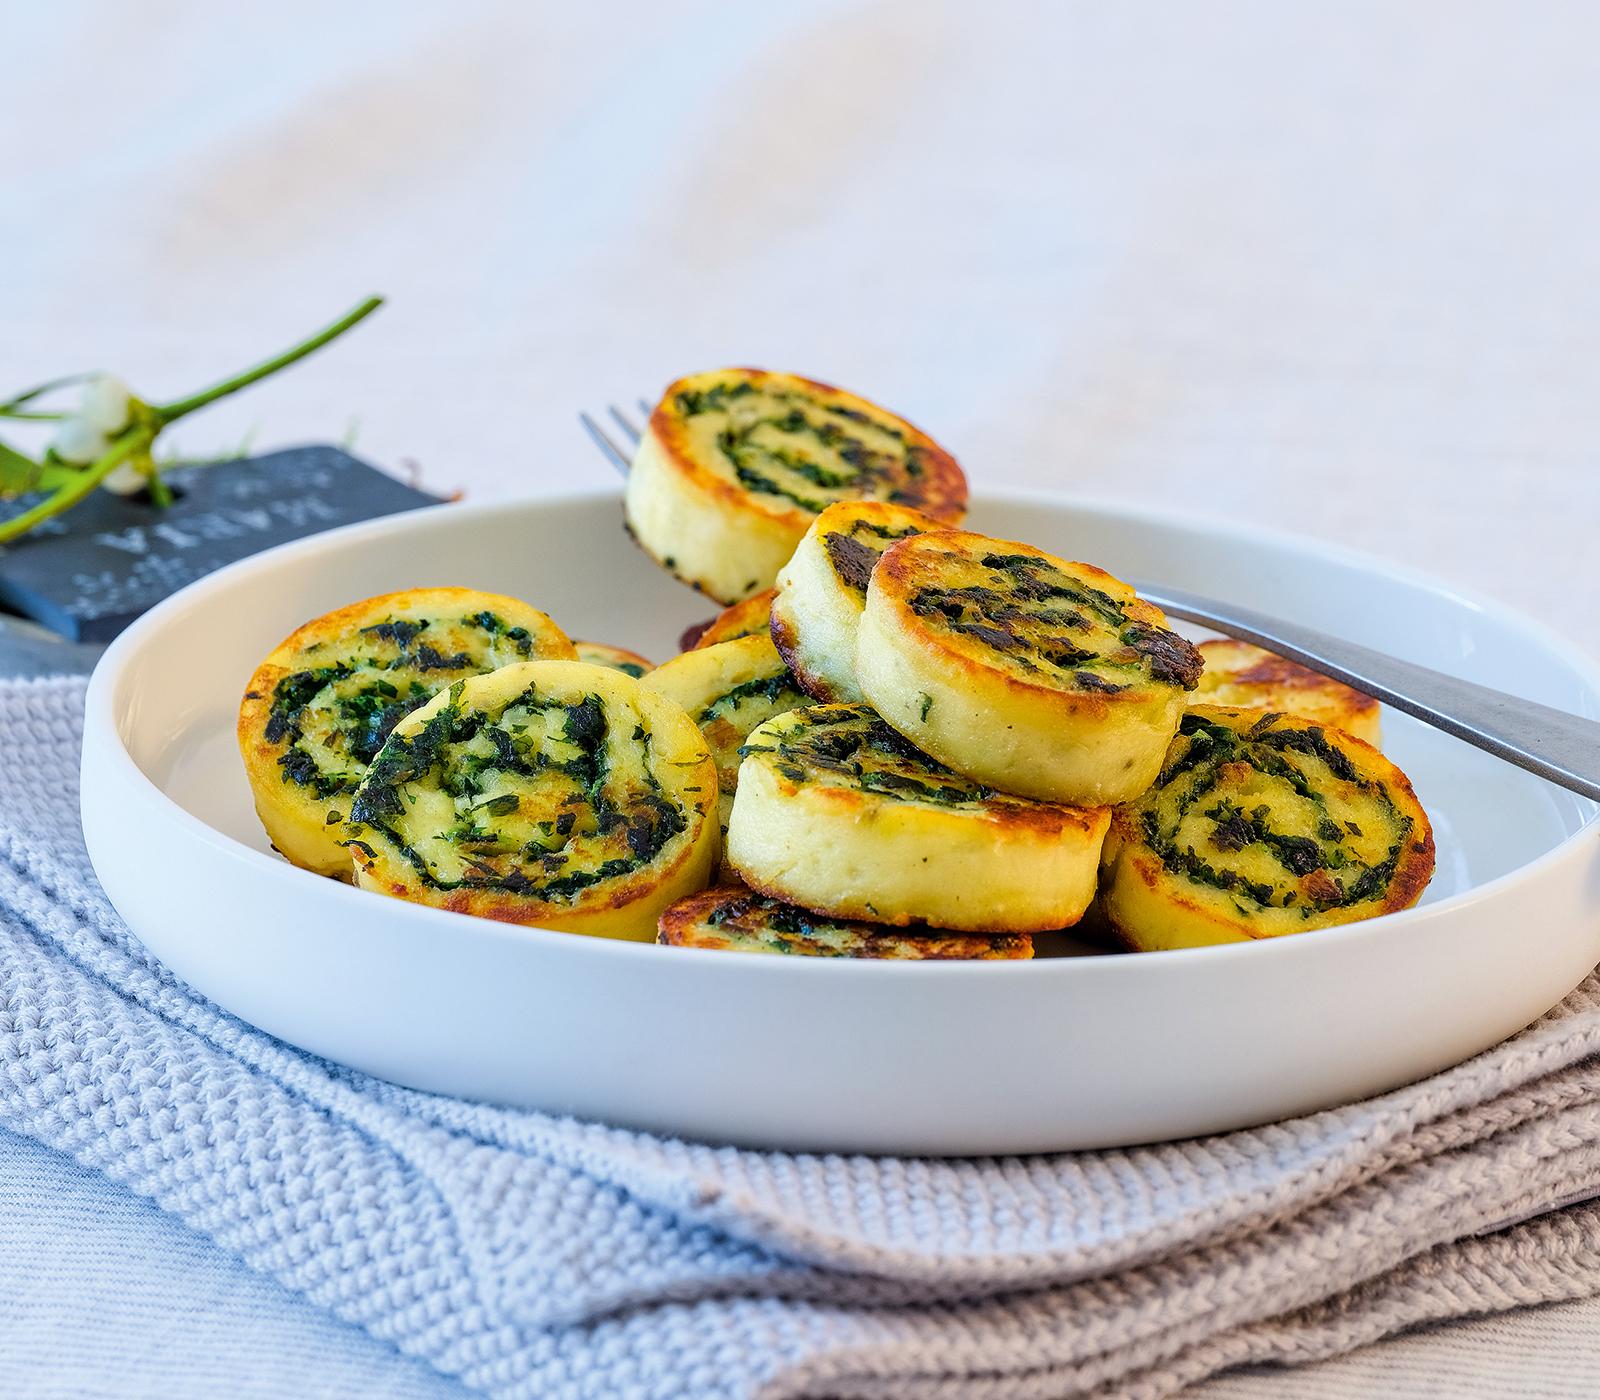 Kartoffel-Spinat-Rolle